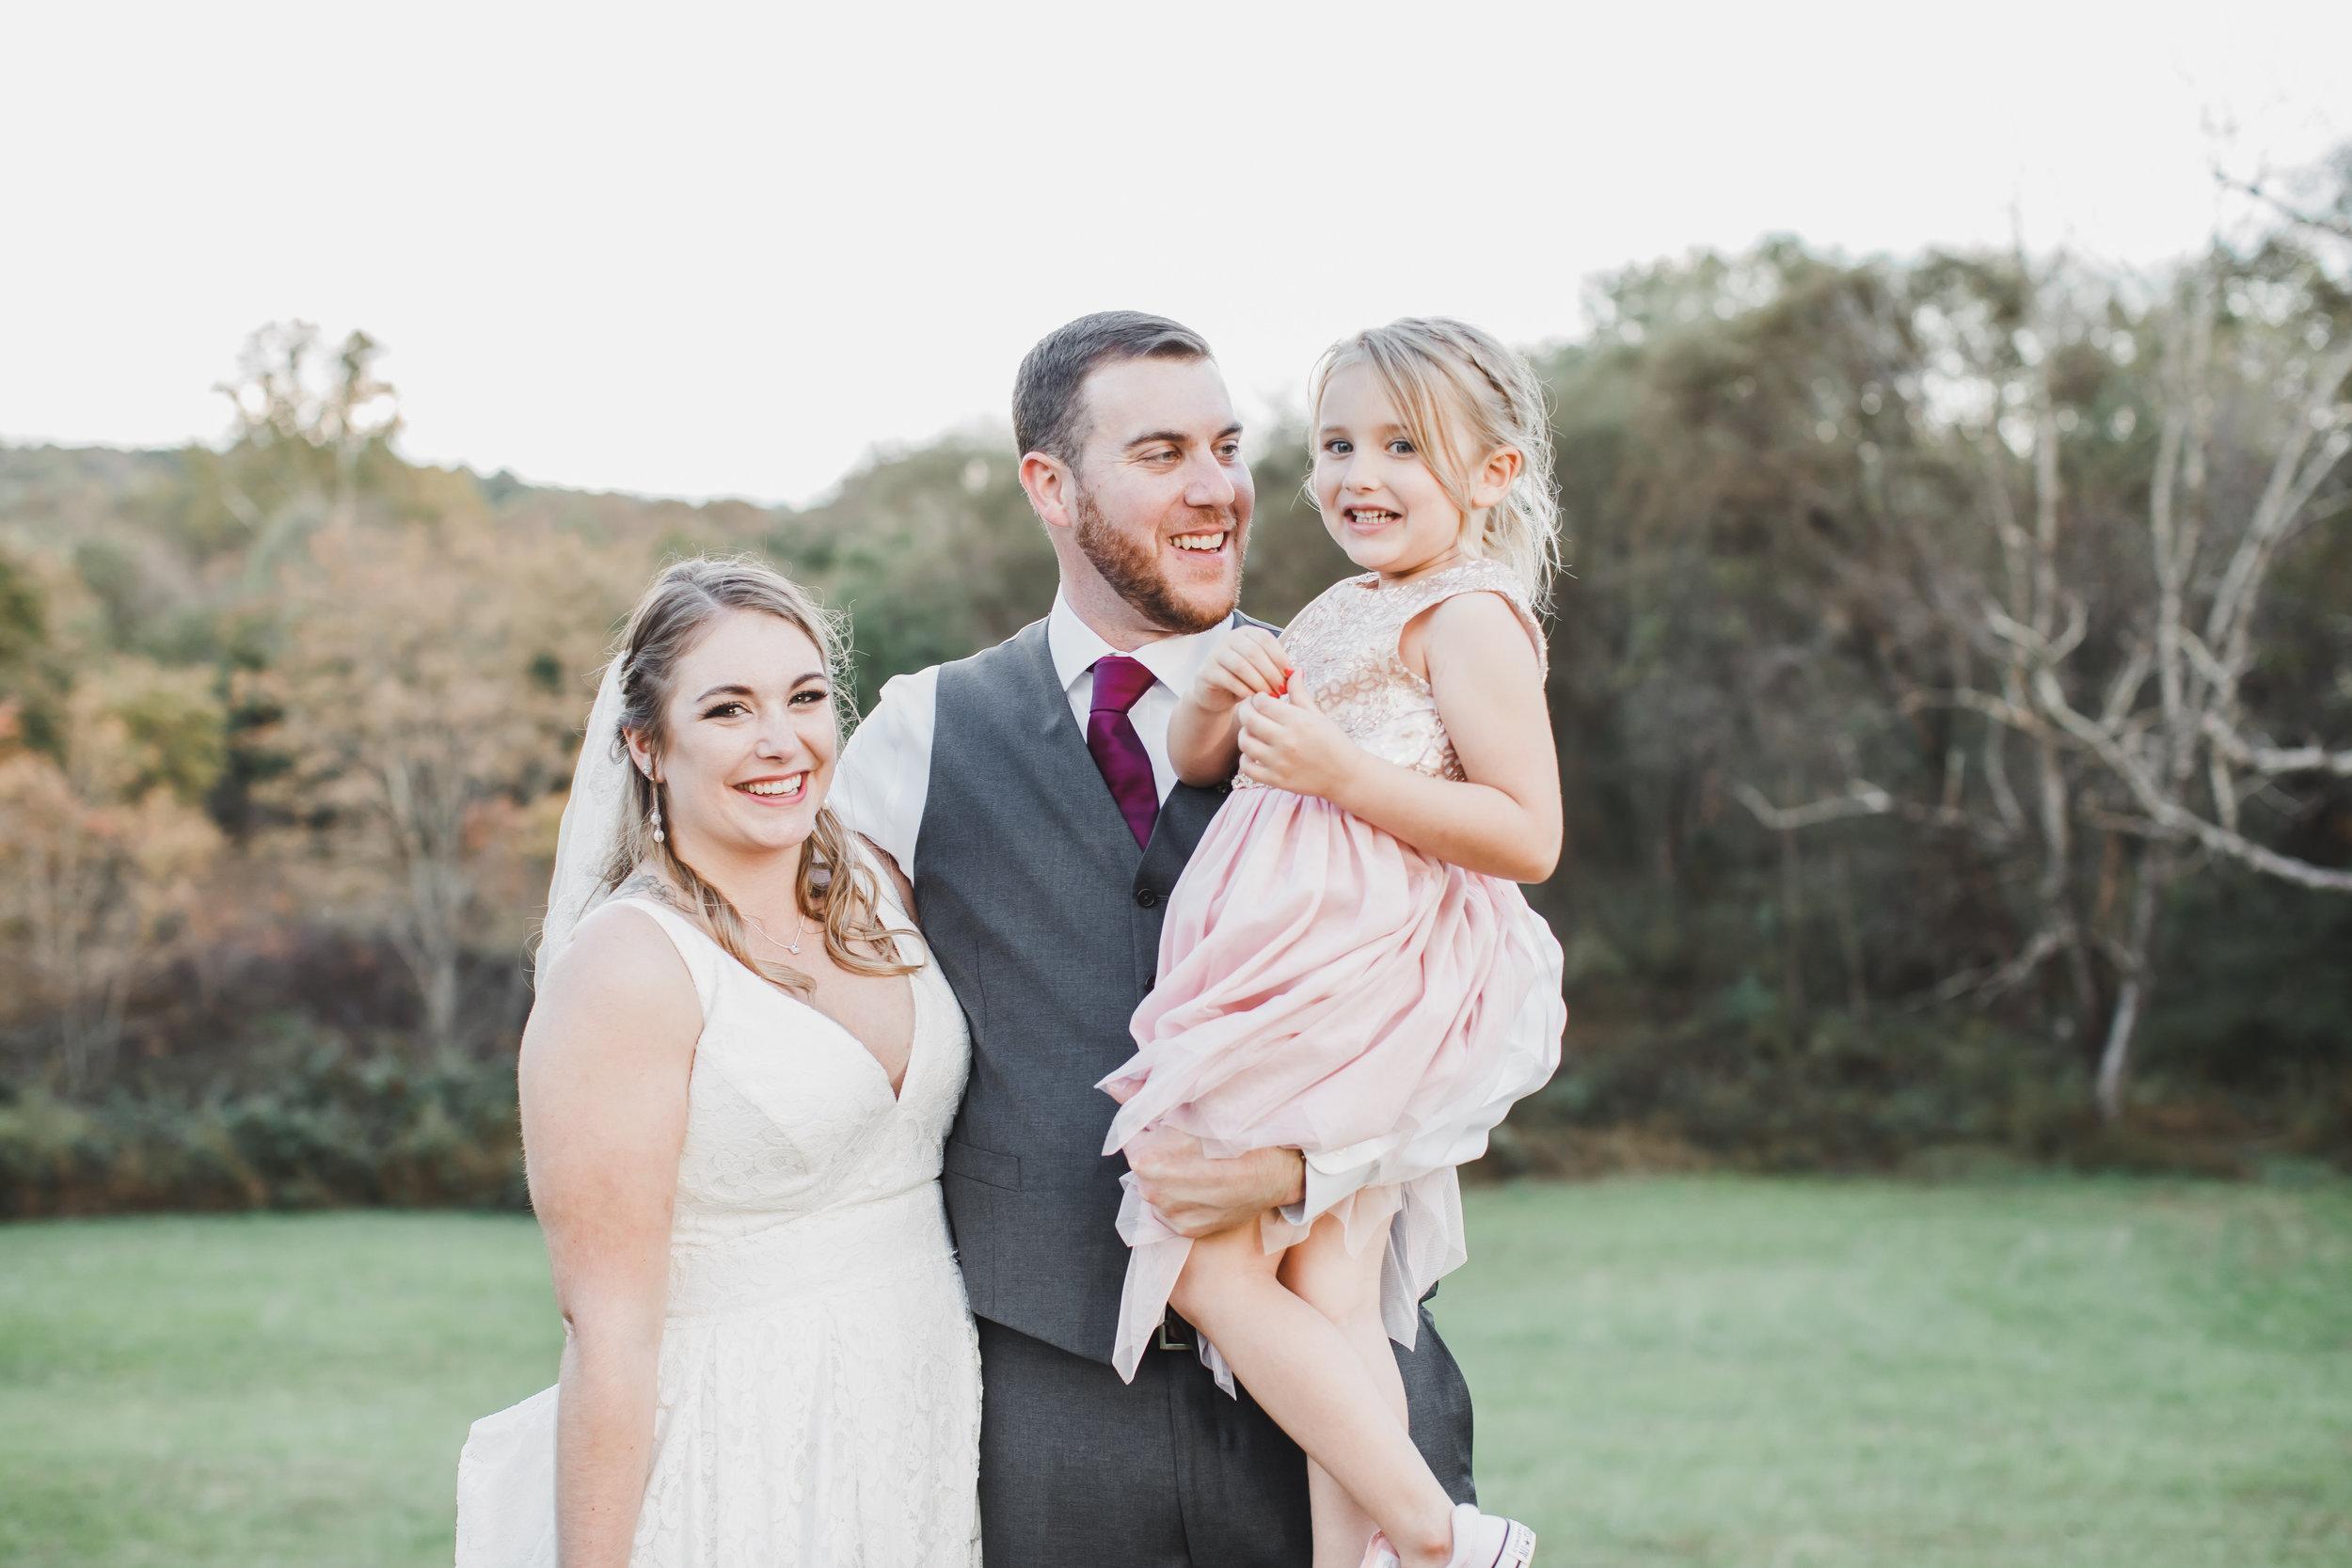 Fling - Virginia Wedding Photographer - Photography by Amy Nicole-4649.jpg